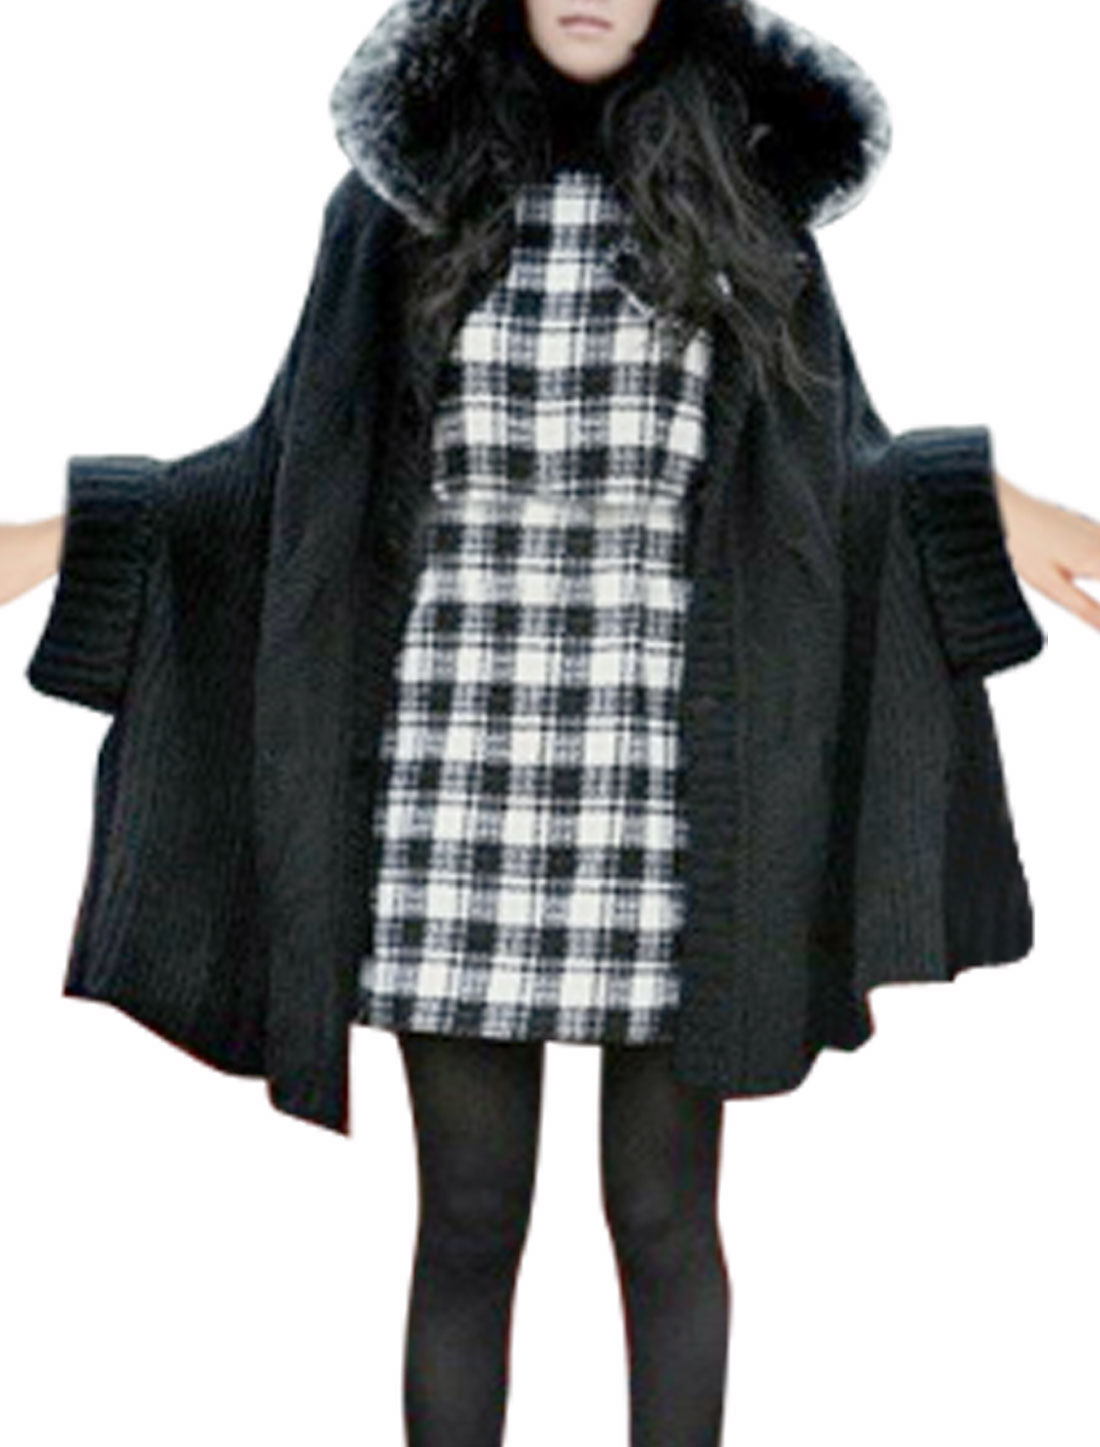 Women Short Dolman Sleeve Black Hooded Tunic Sweater M